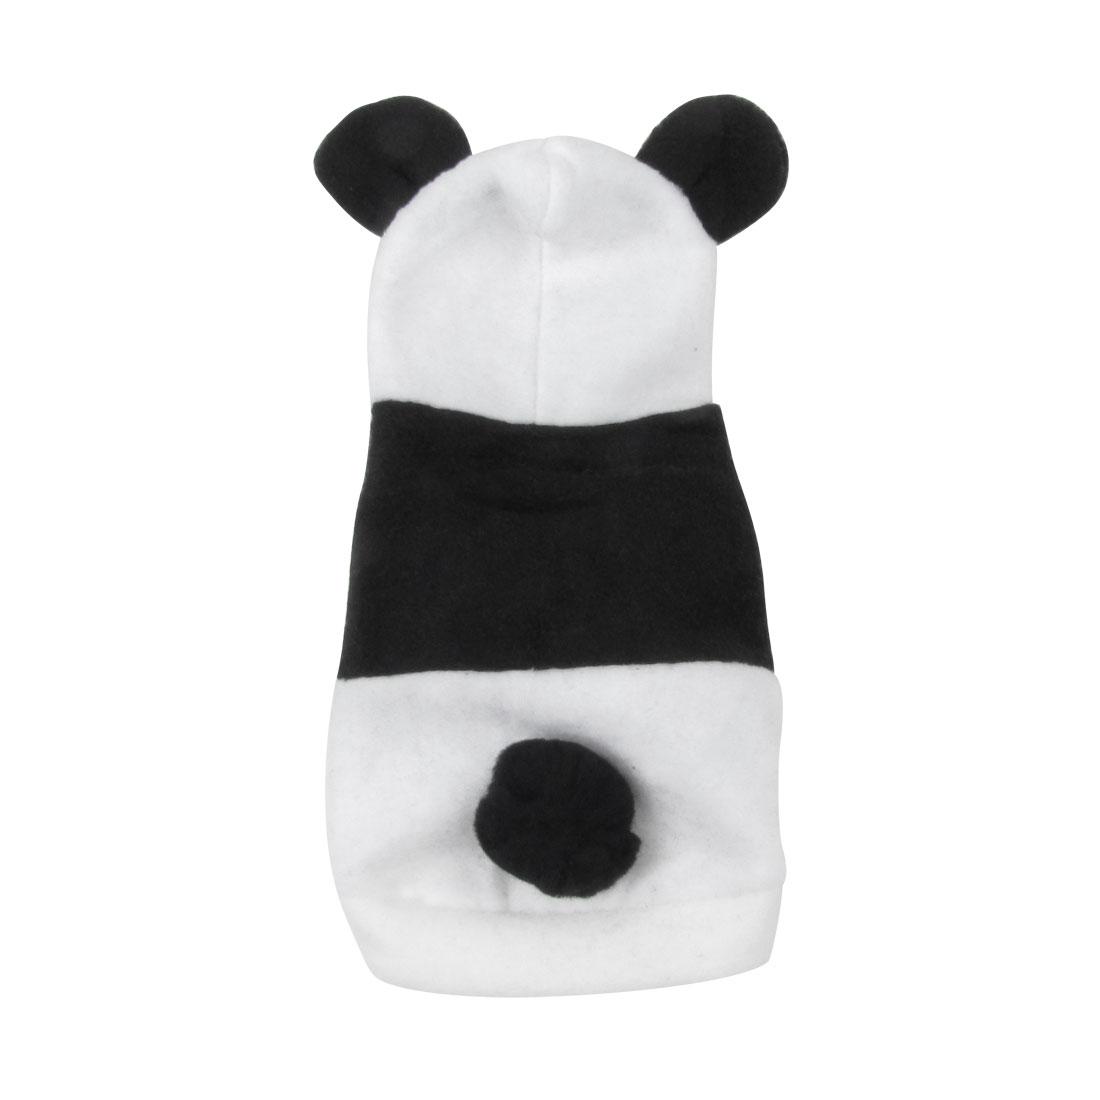 Single Breasted Panda Design Hoodie Yorkie Pet Dog Coat White Black Size XS